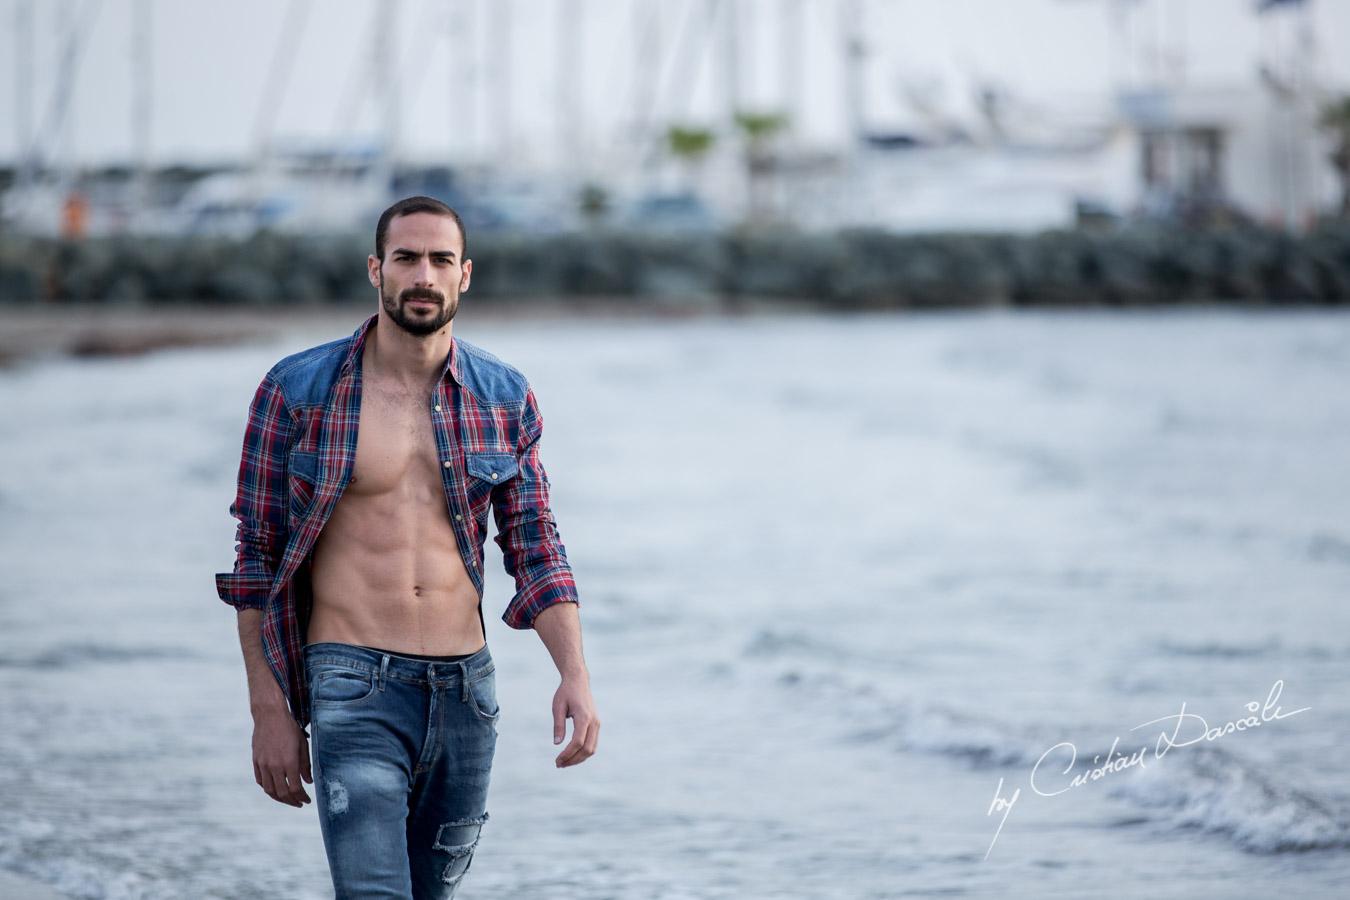 Model Photo-shoot at Saint Raphael Beach - 11